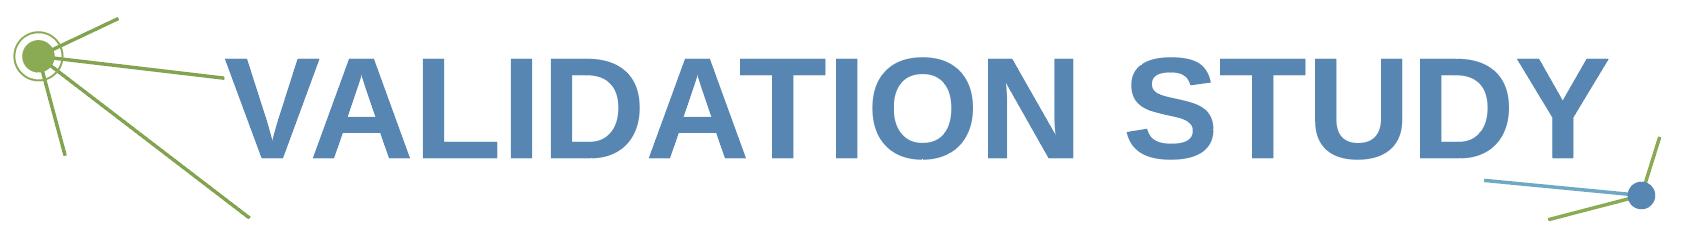 Header_Validation.png